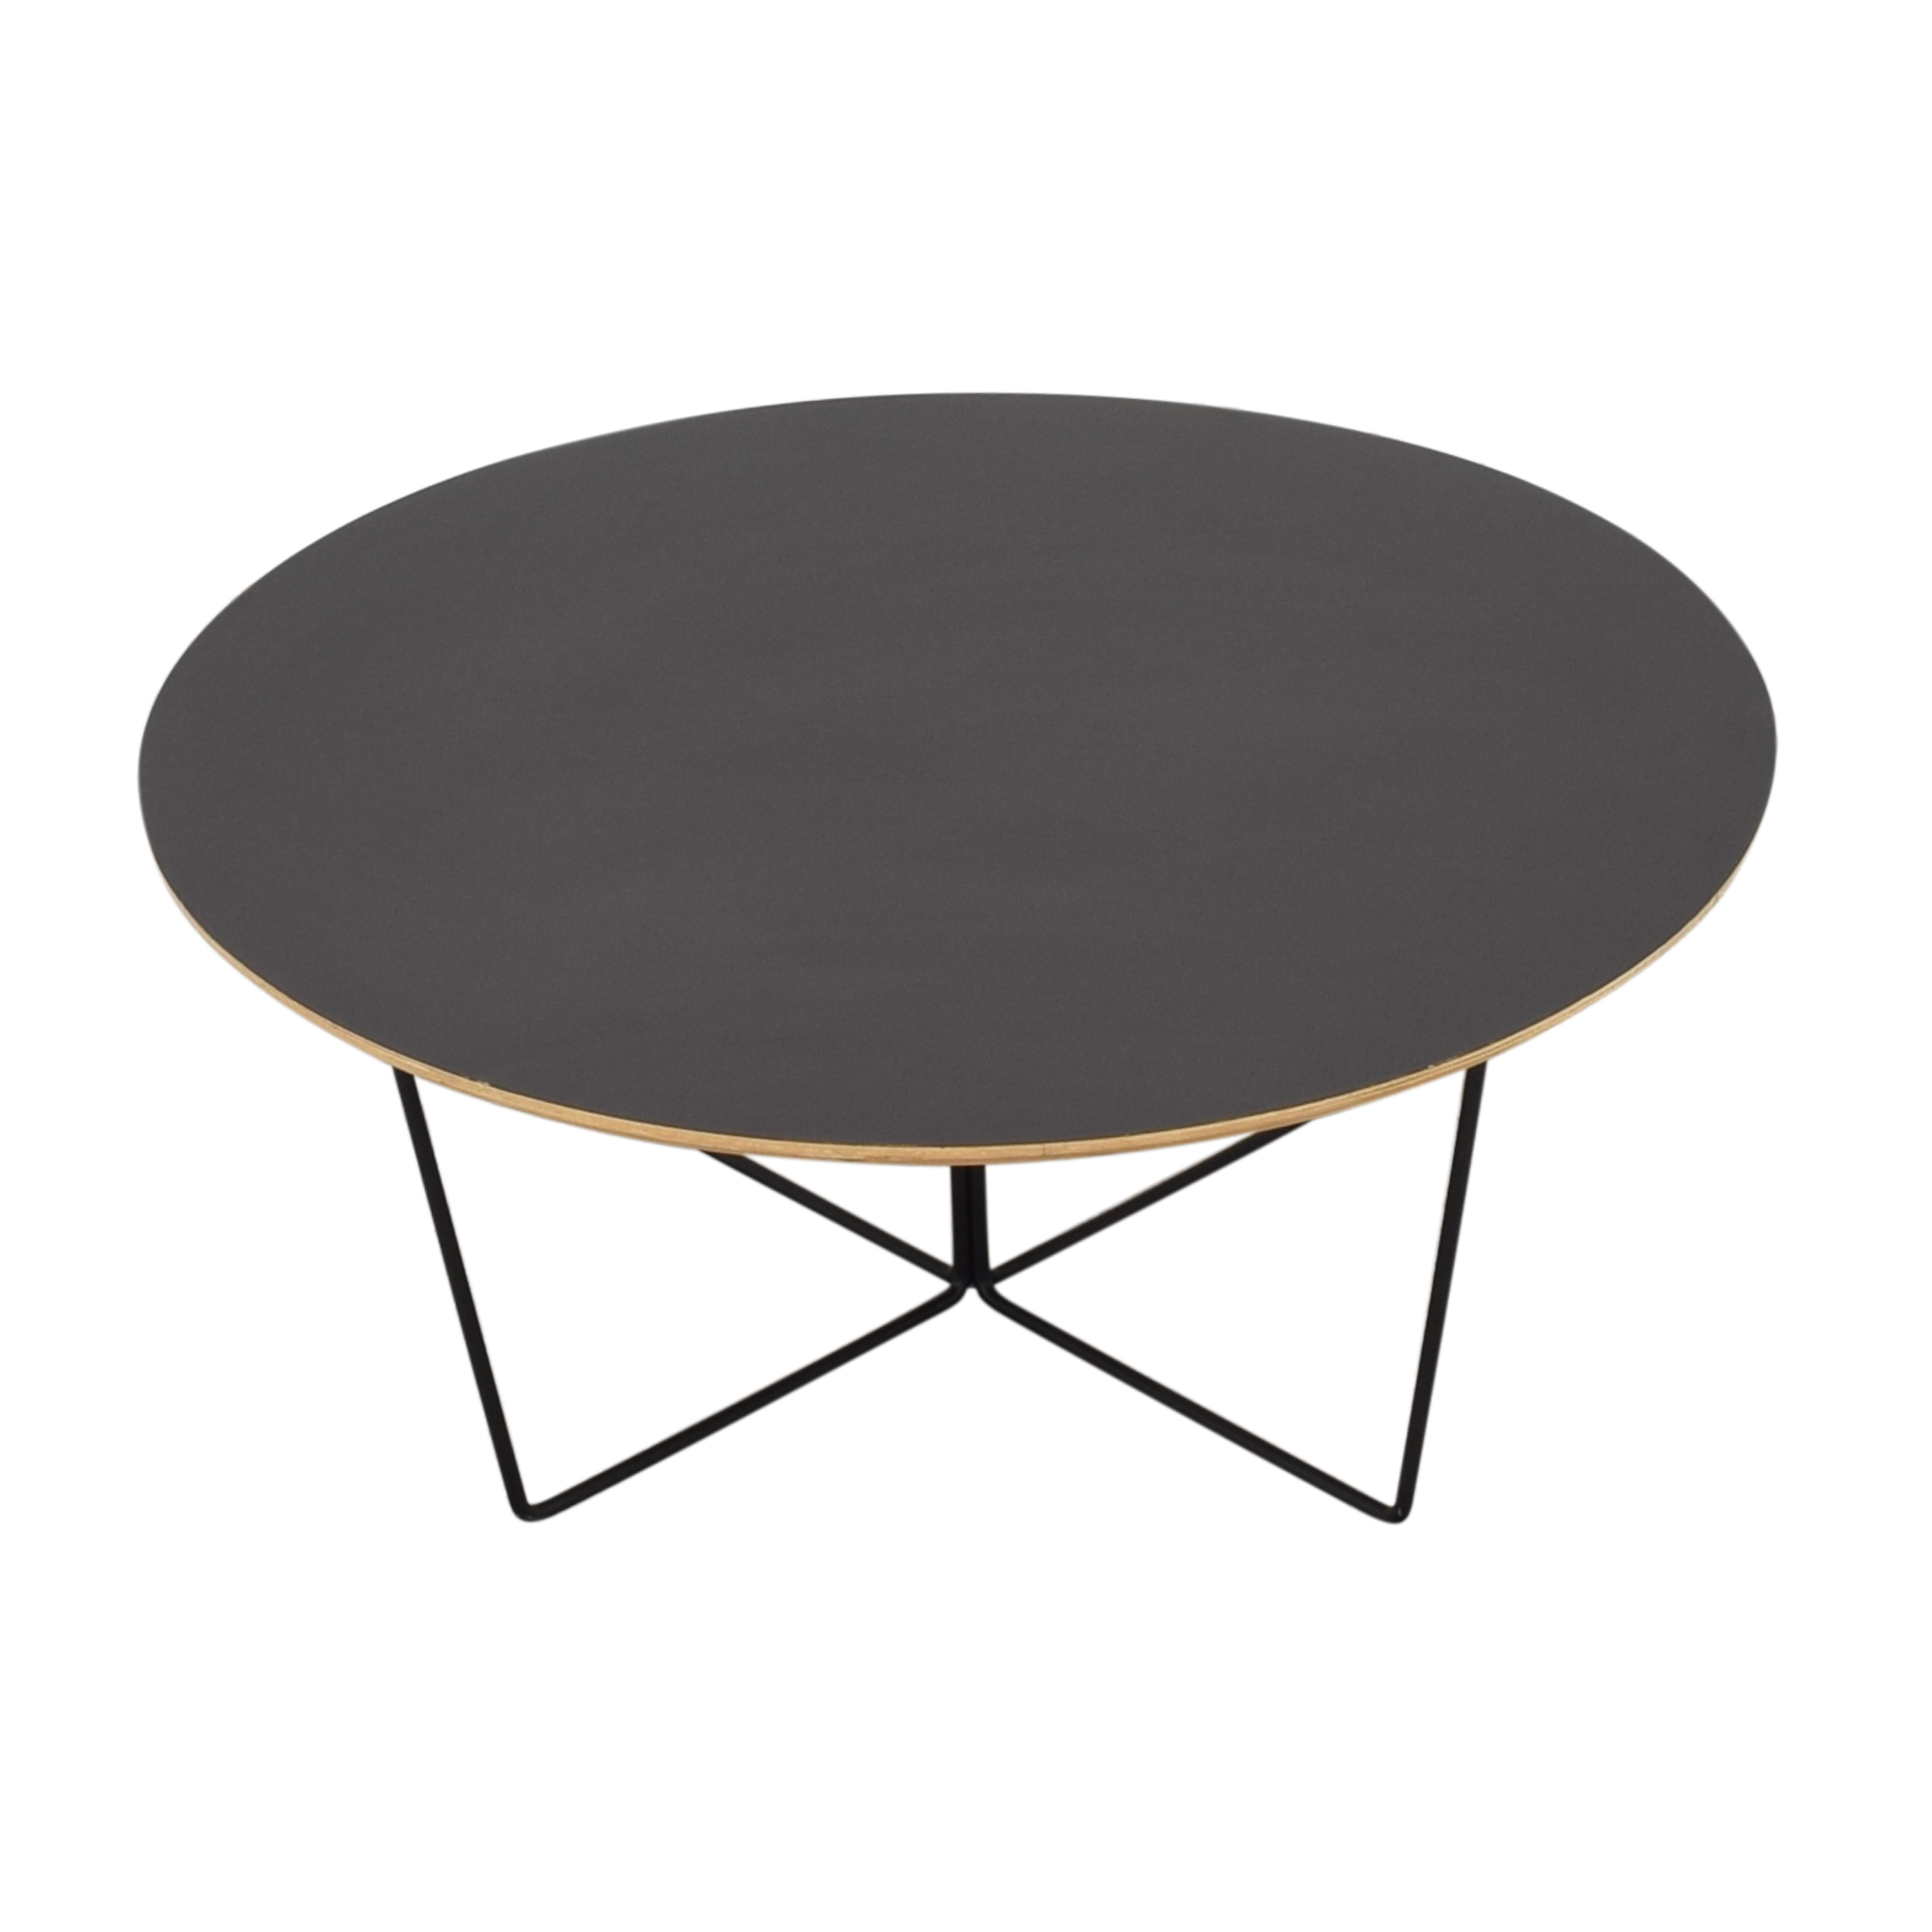 buy GUS* Modern Black Array Round Coffee Table Gus Modern Tables